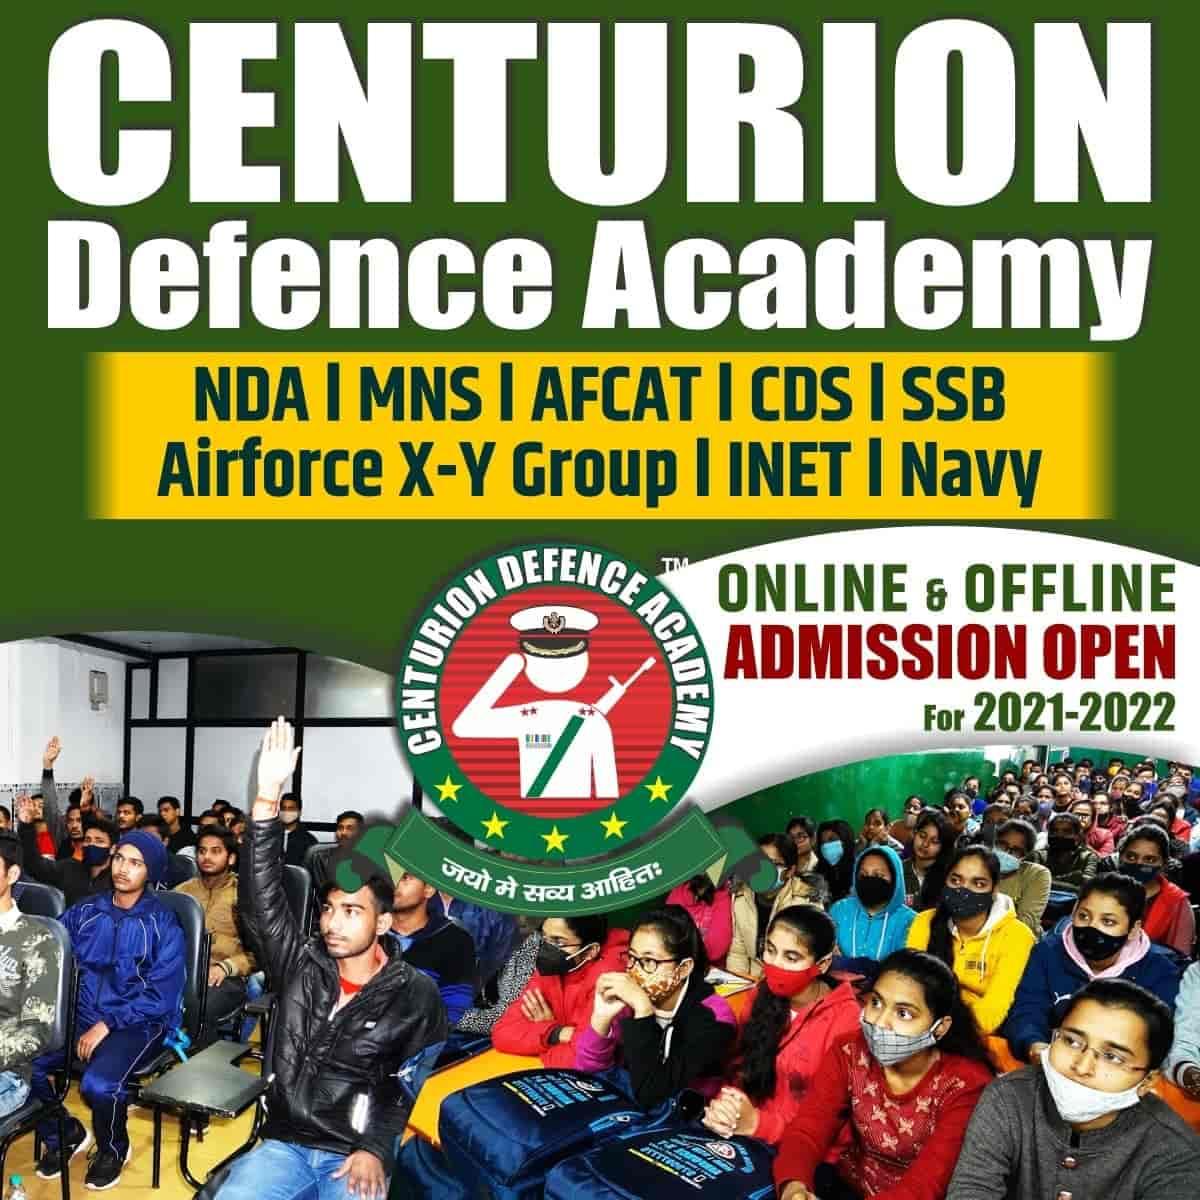 centurion online course